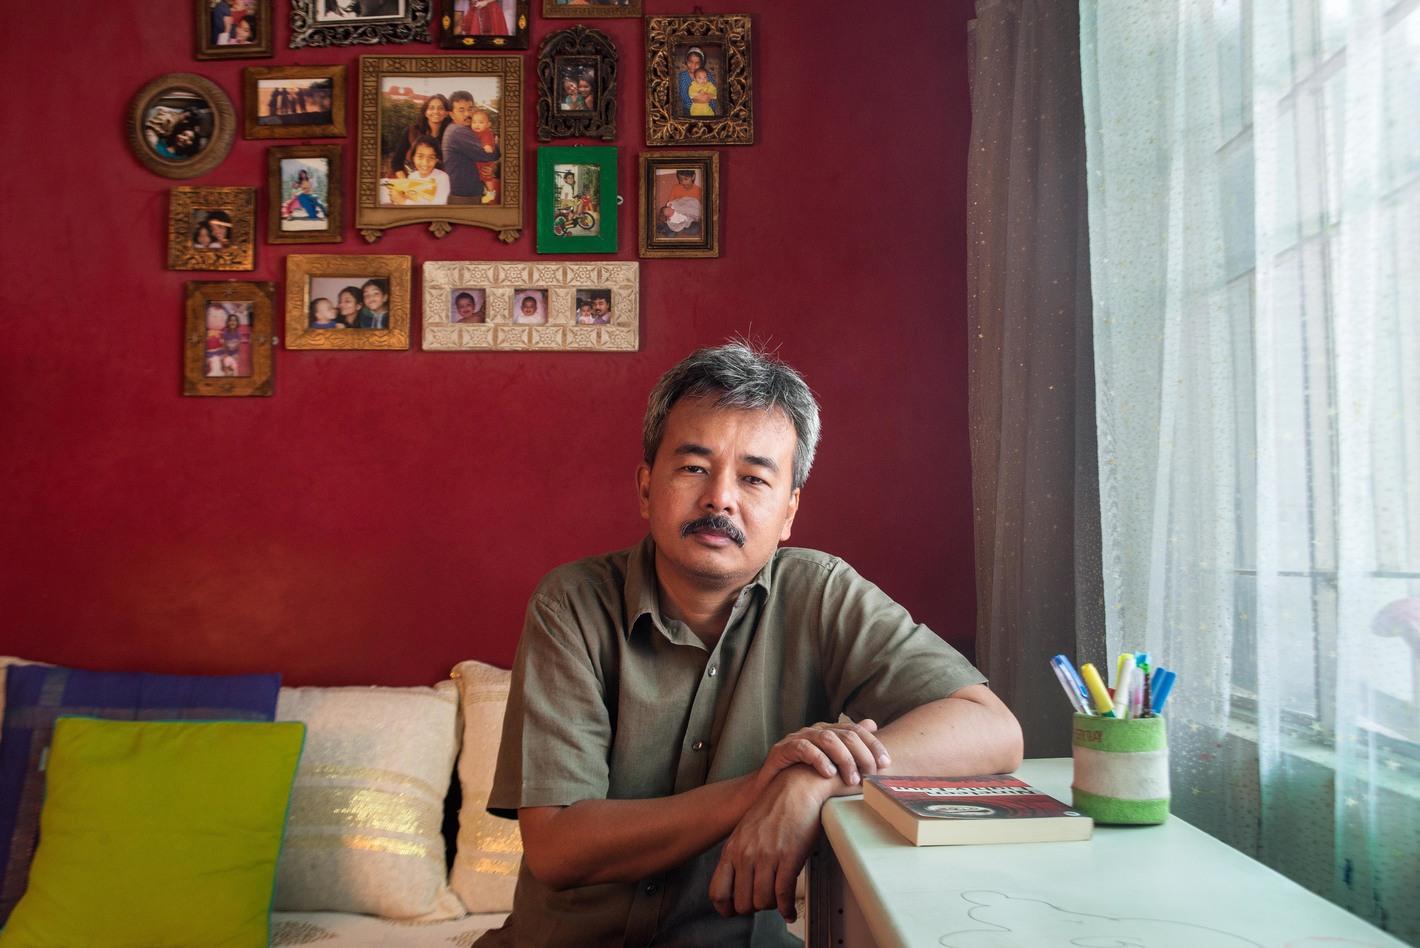 Munish Tamang is a professor of English Literature at Delhi University. Photographed at his residence in Vasant Vihar